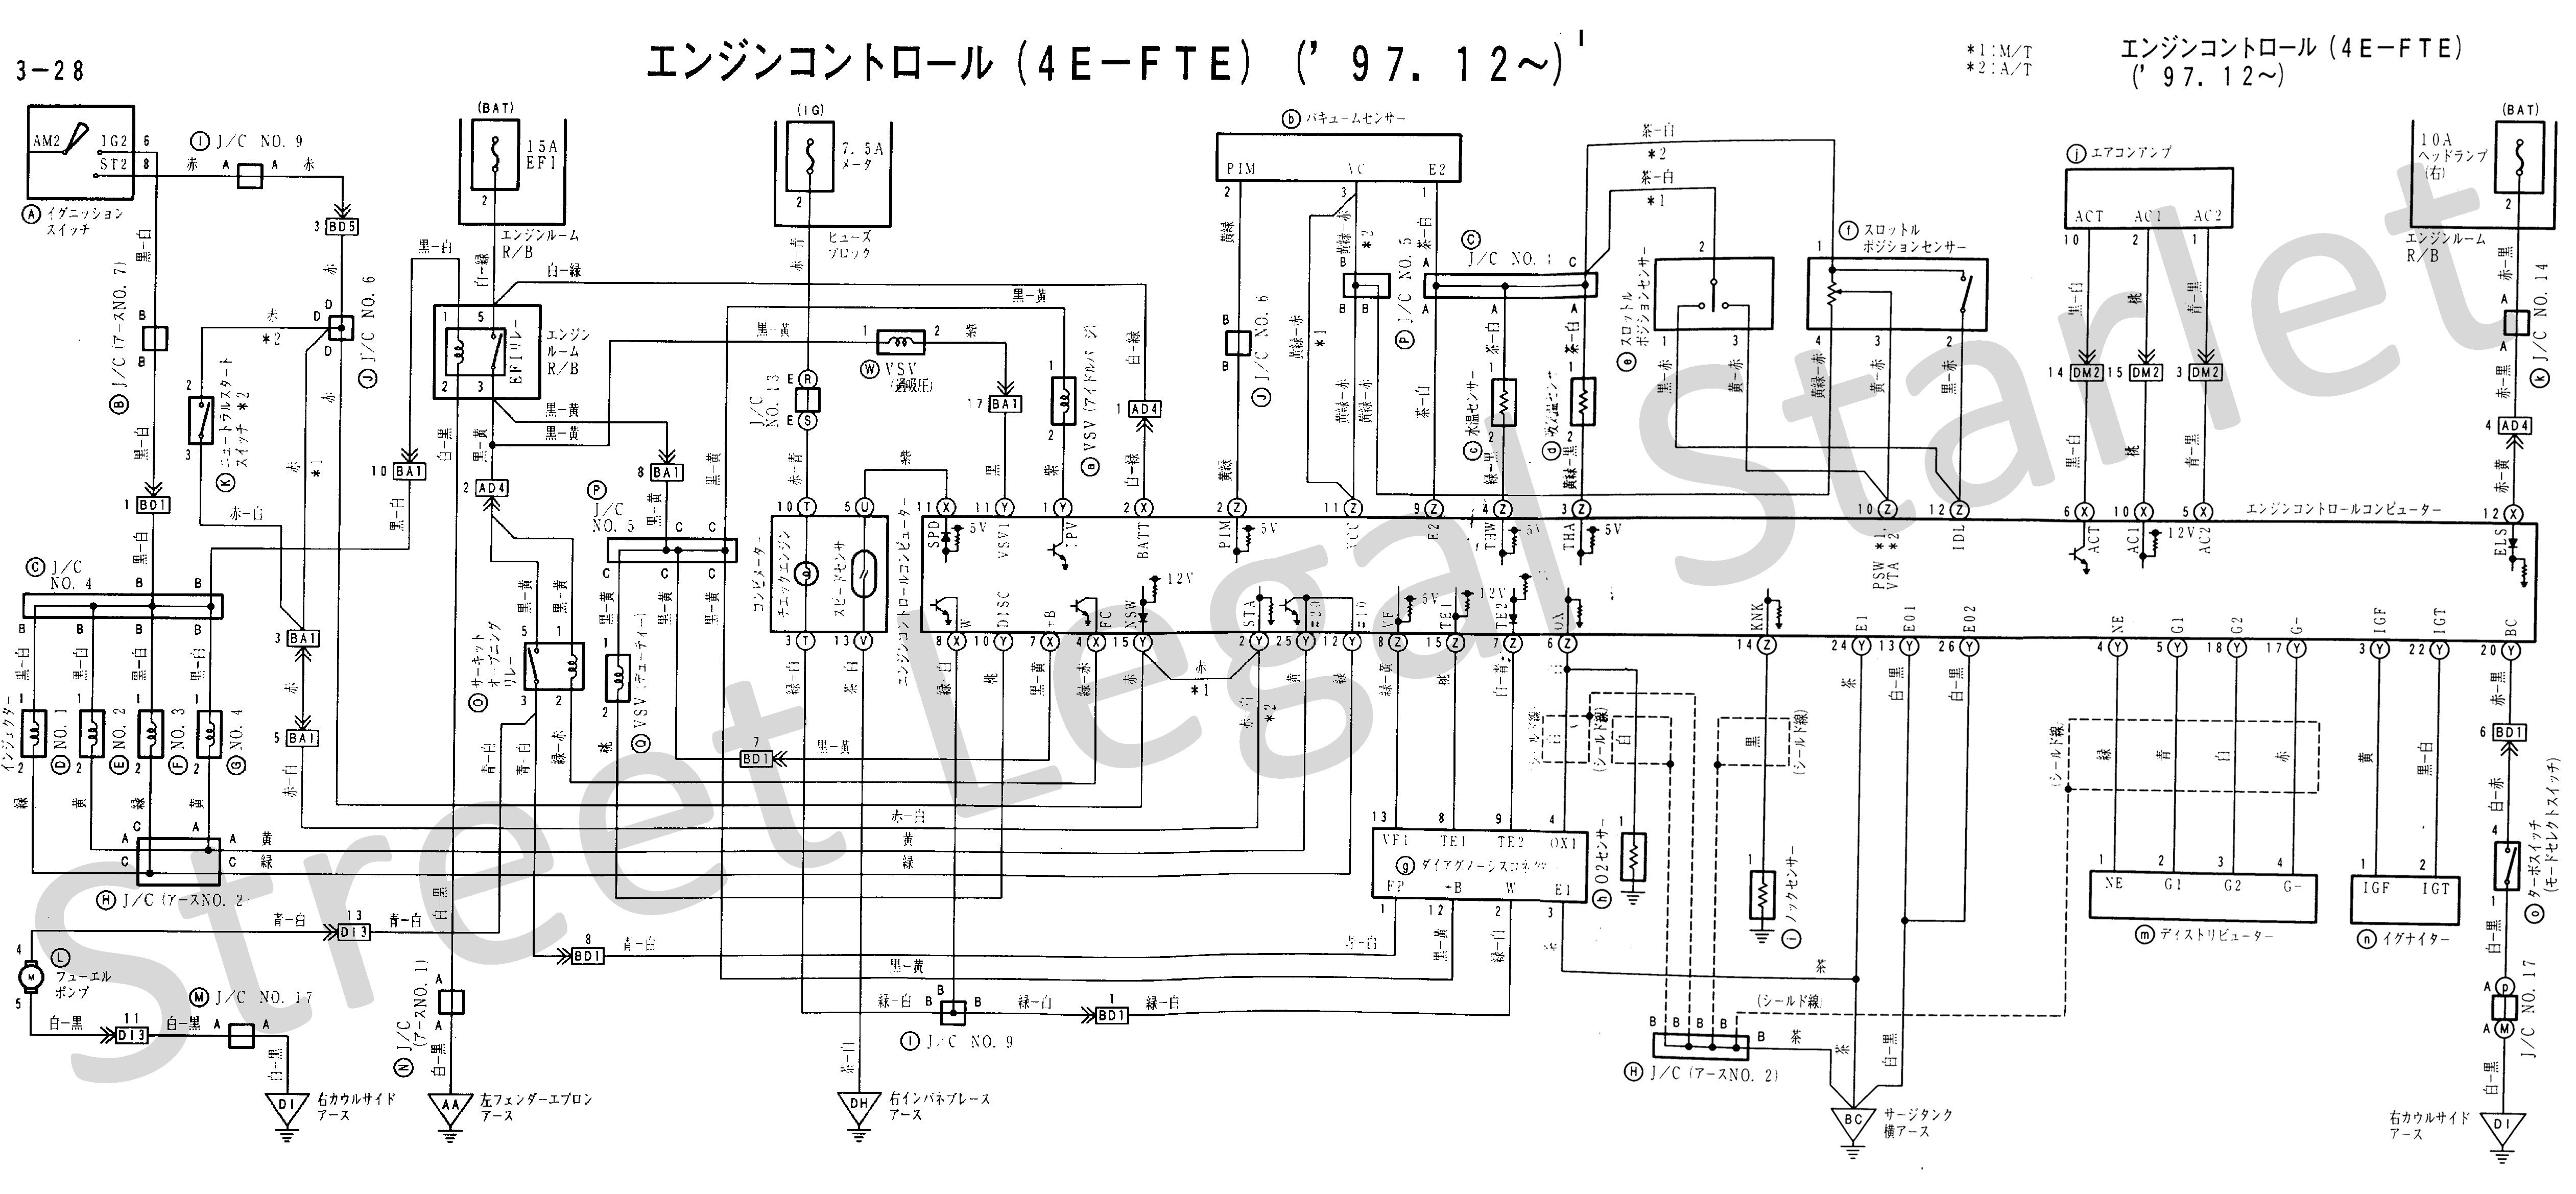 Toyota 1nz Fe Engine Wiring Diagram Wiring Diagram toyota Great Corolla Valid Wiring Diagram Central Of Toyota 1nz Fe Engine Wiring Diagram